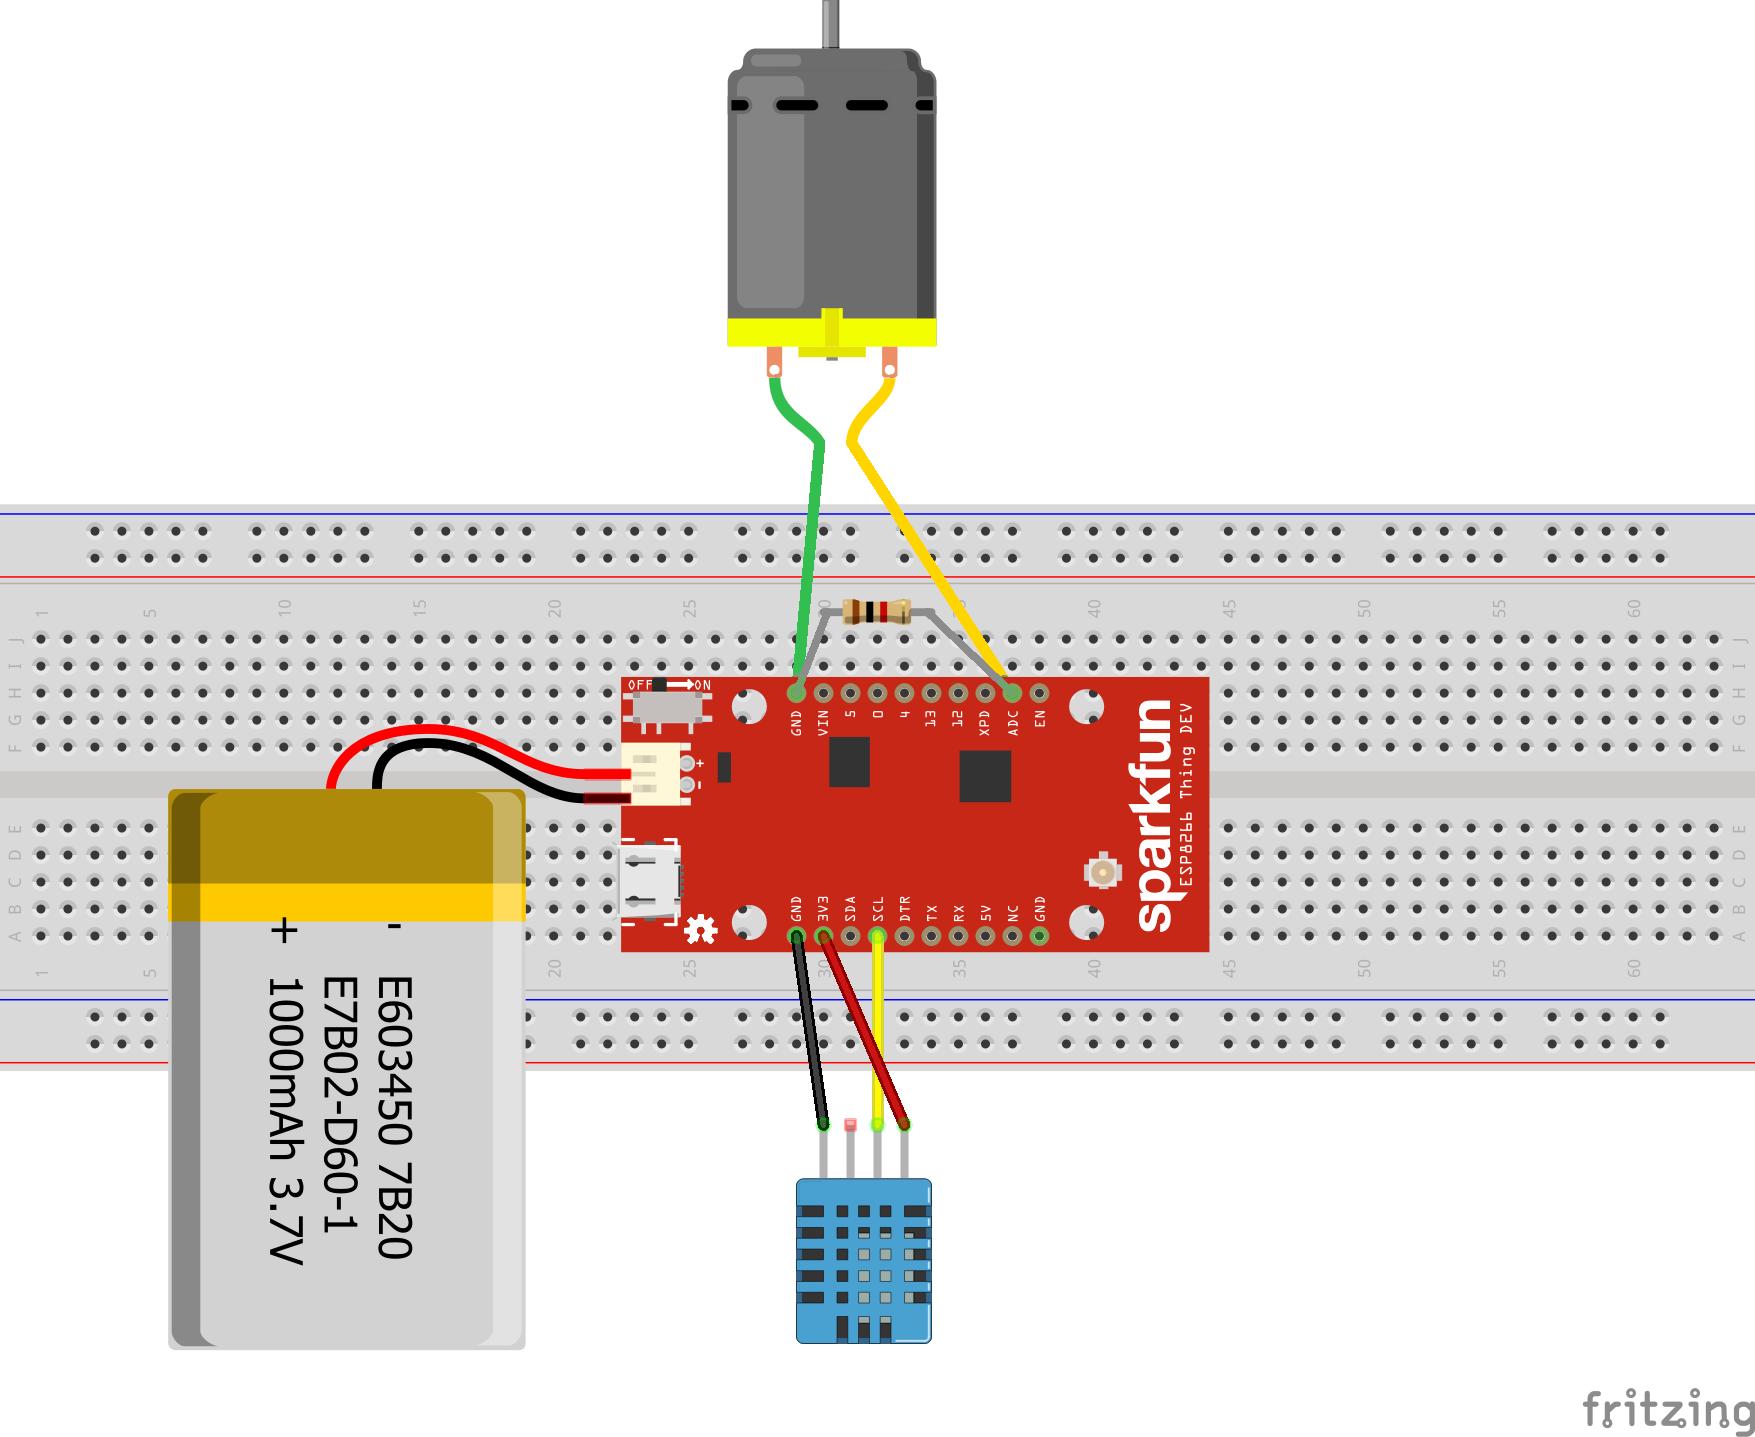 Iot hvac monitor bb bp9ryq7onj